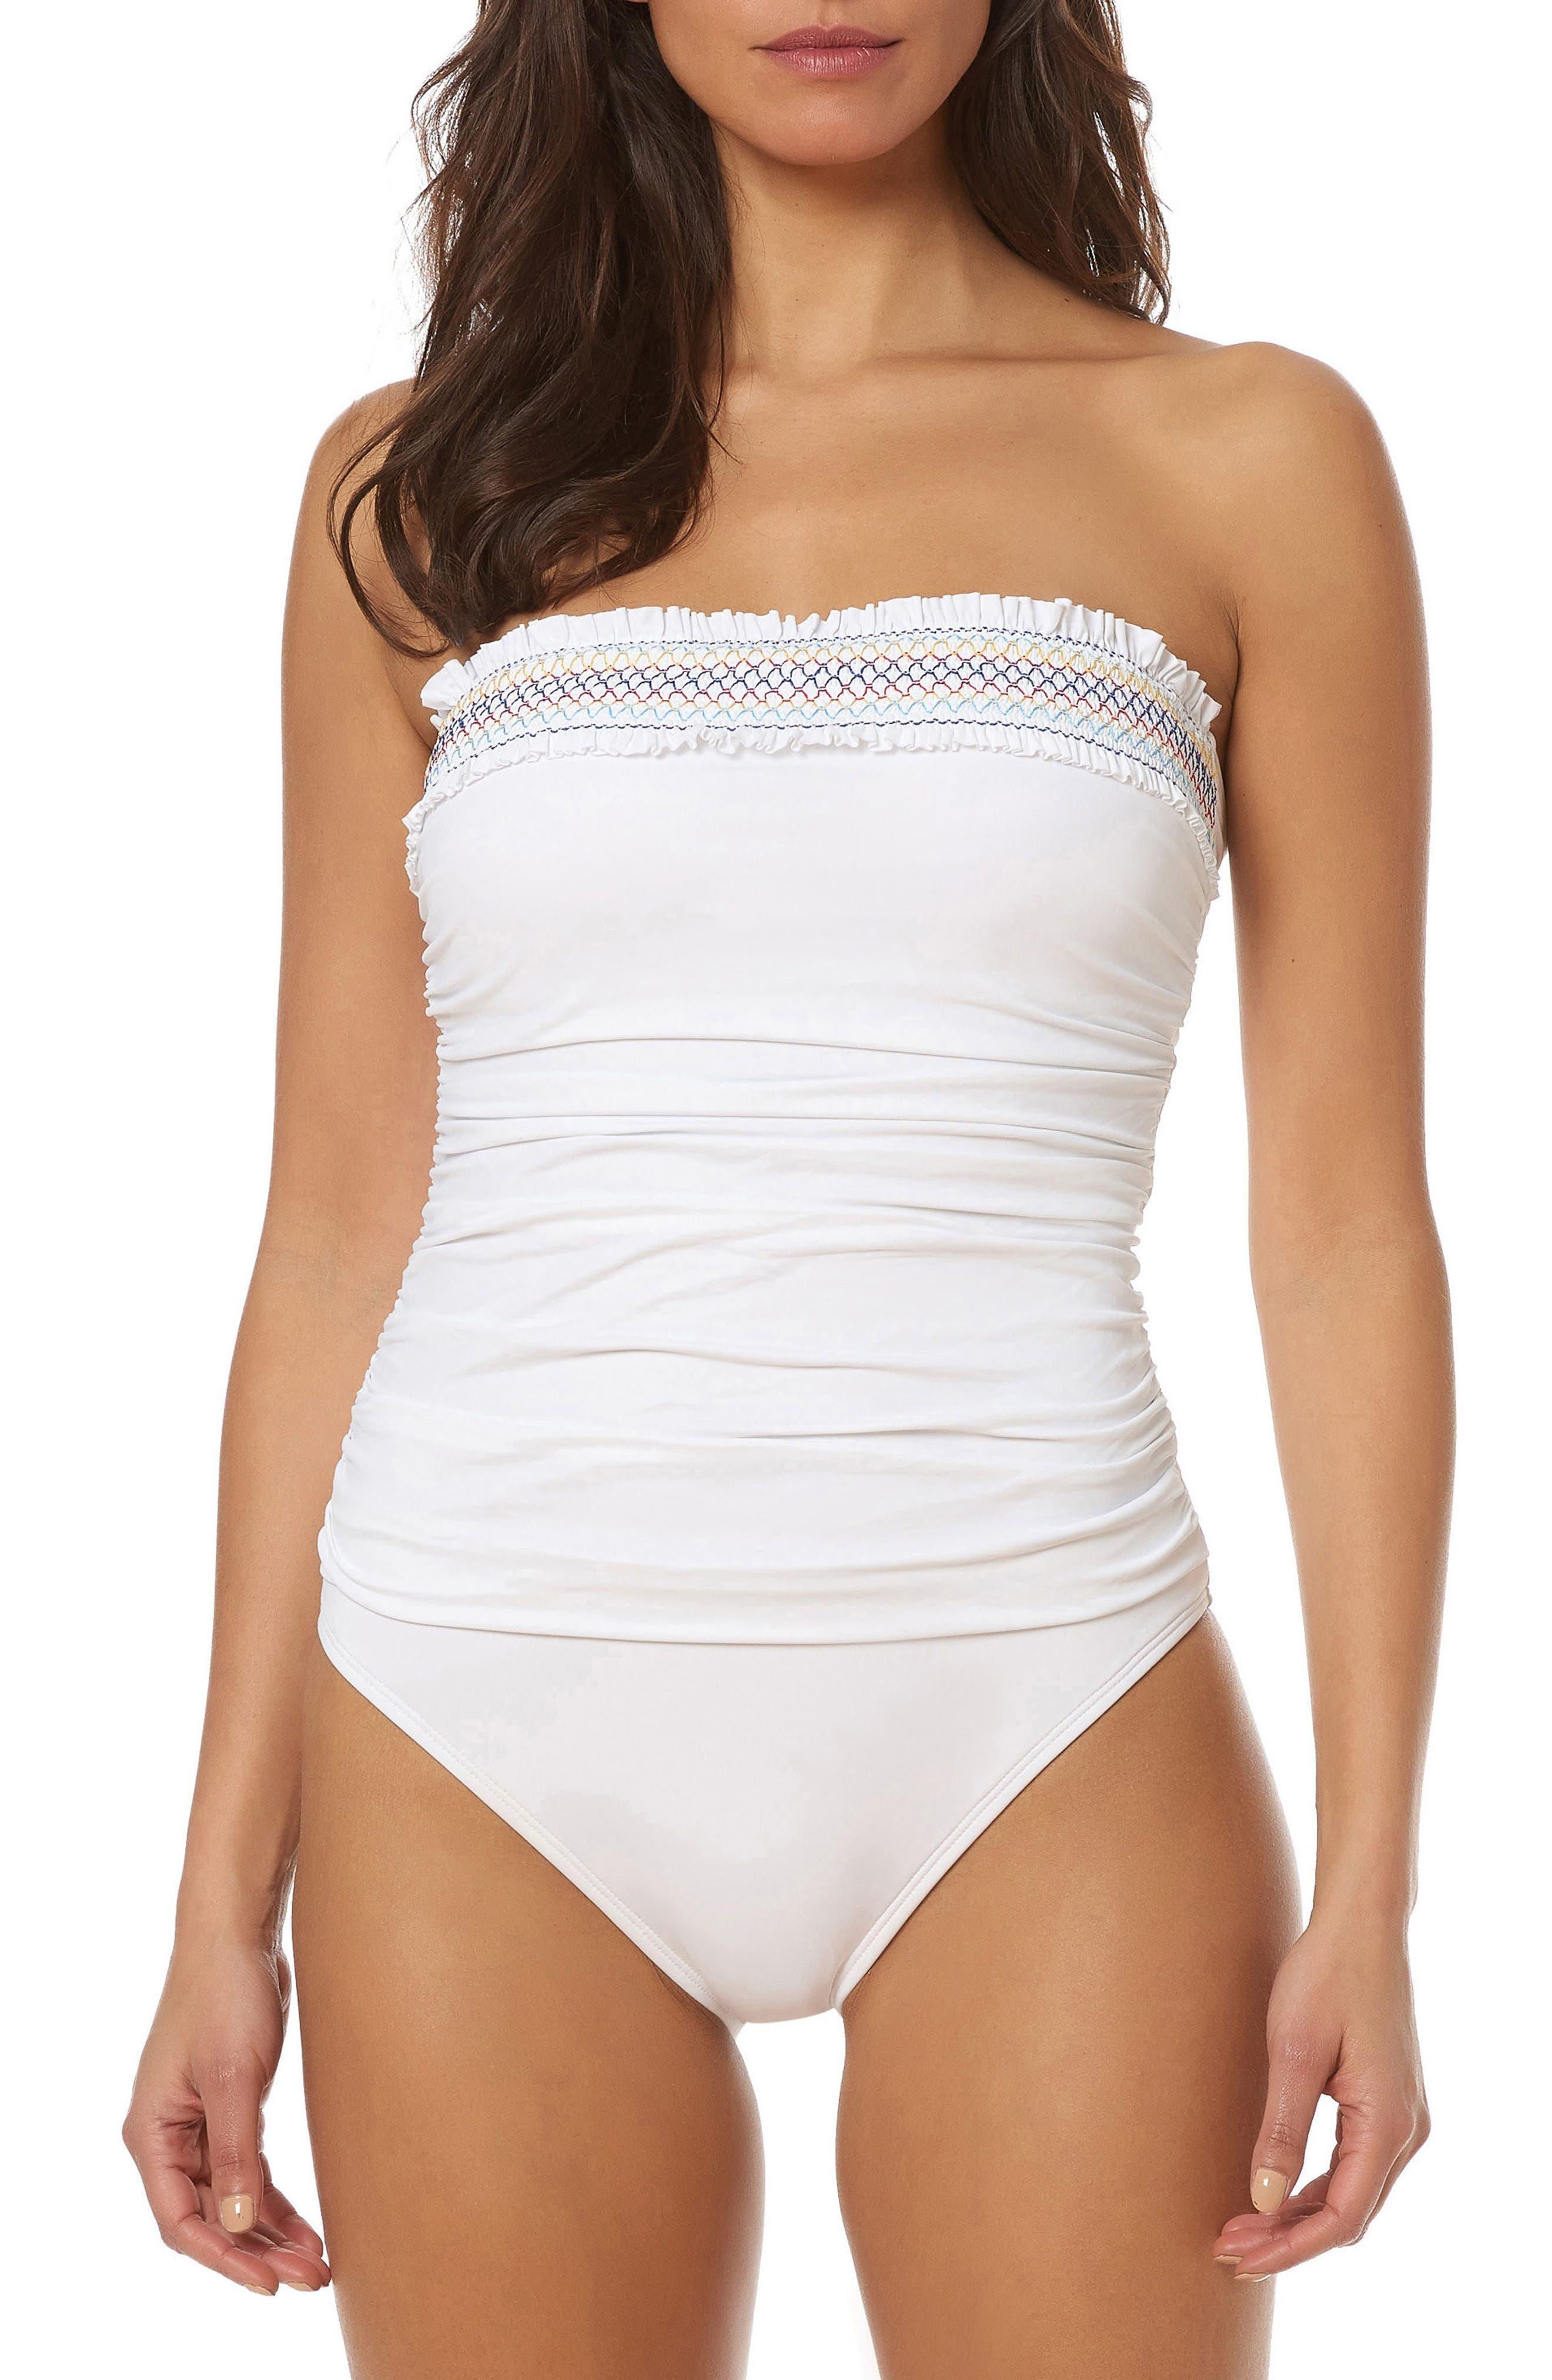 BLEU by Rod Beattie Strapless One-Piece Swimsuit